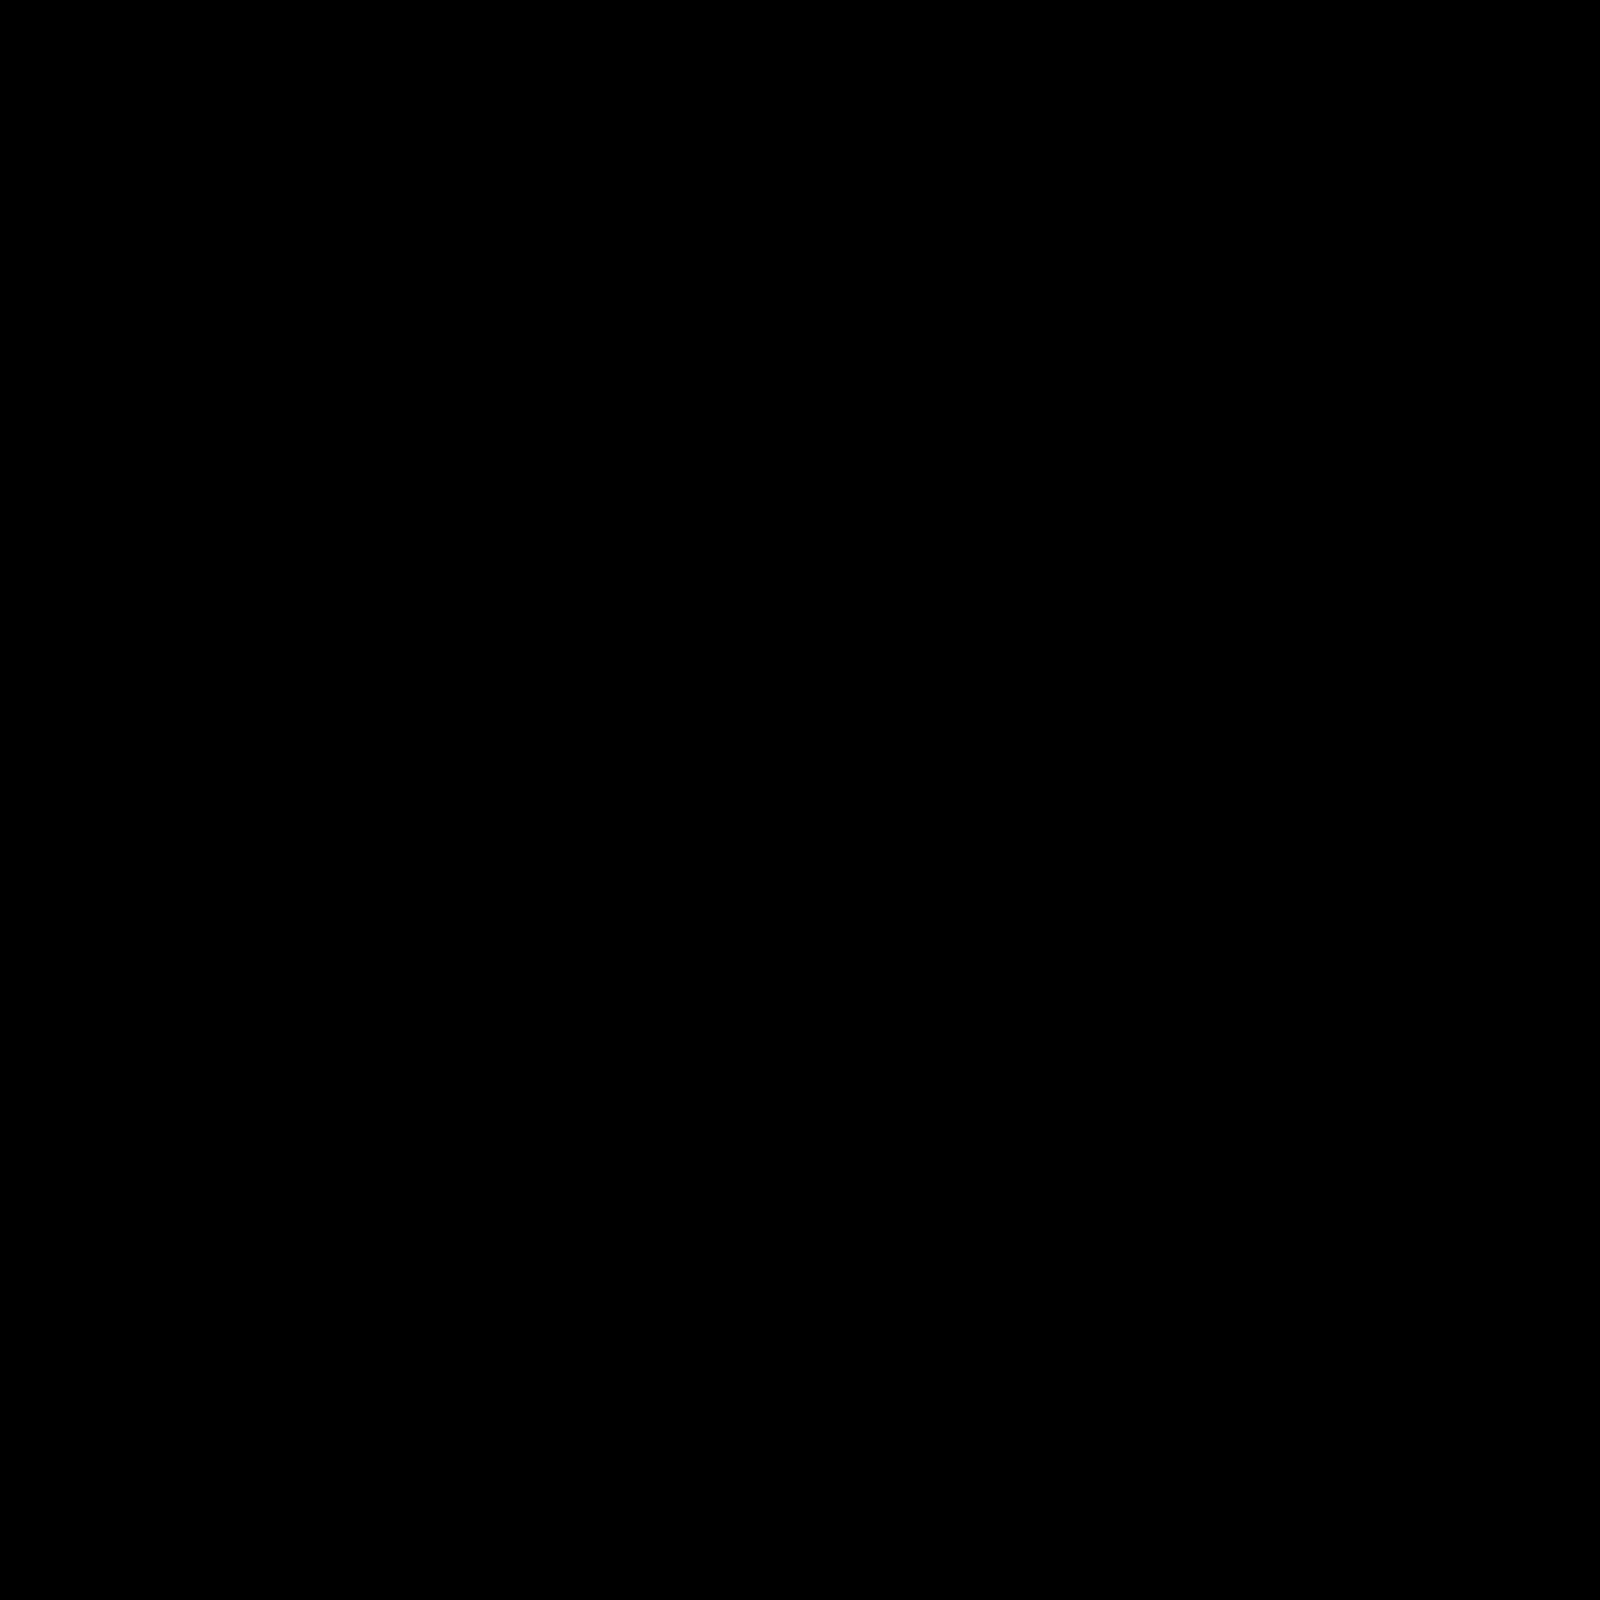 Antenna Internet icon